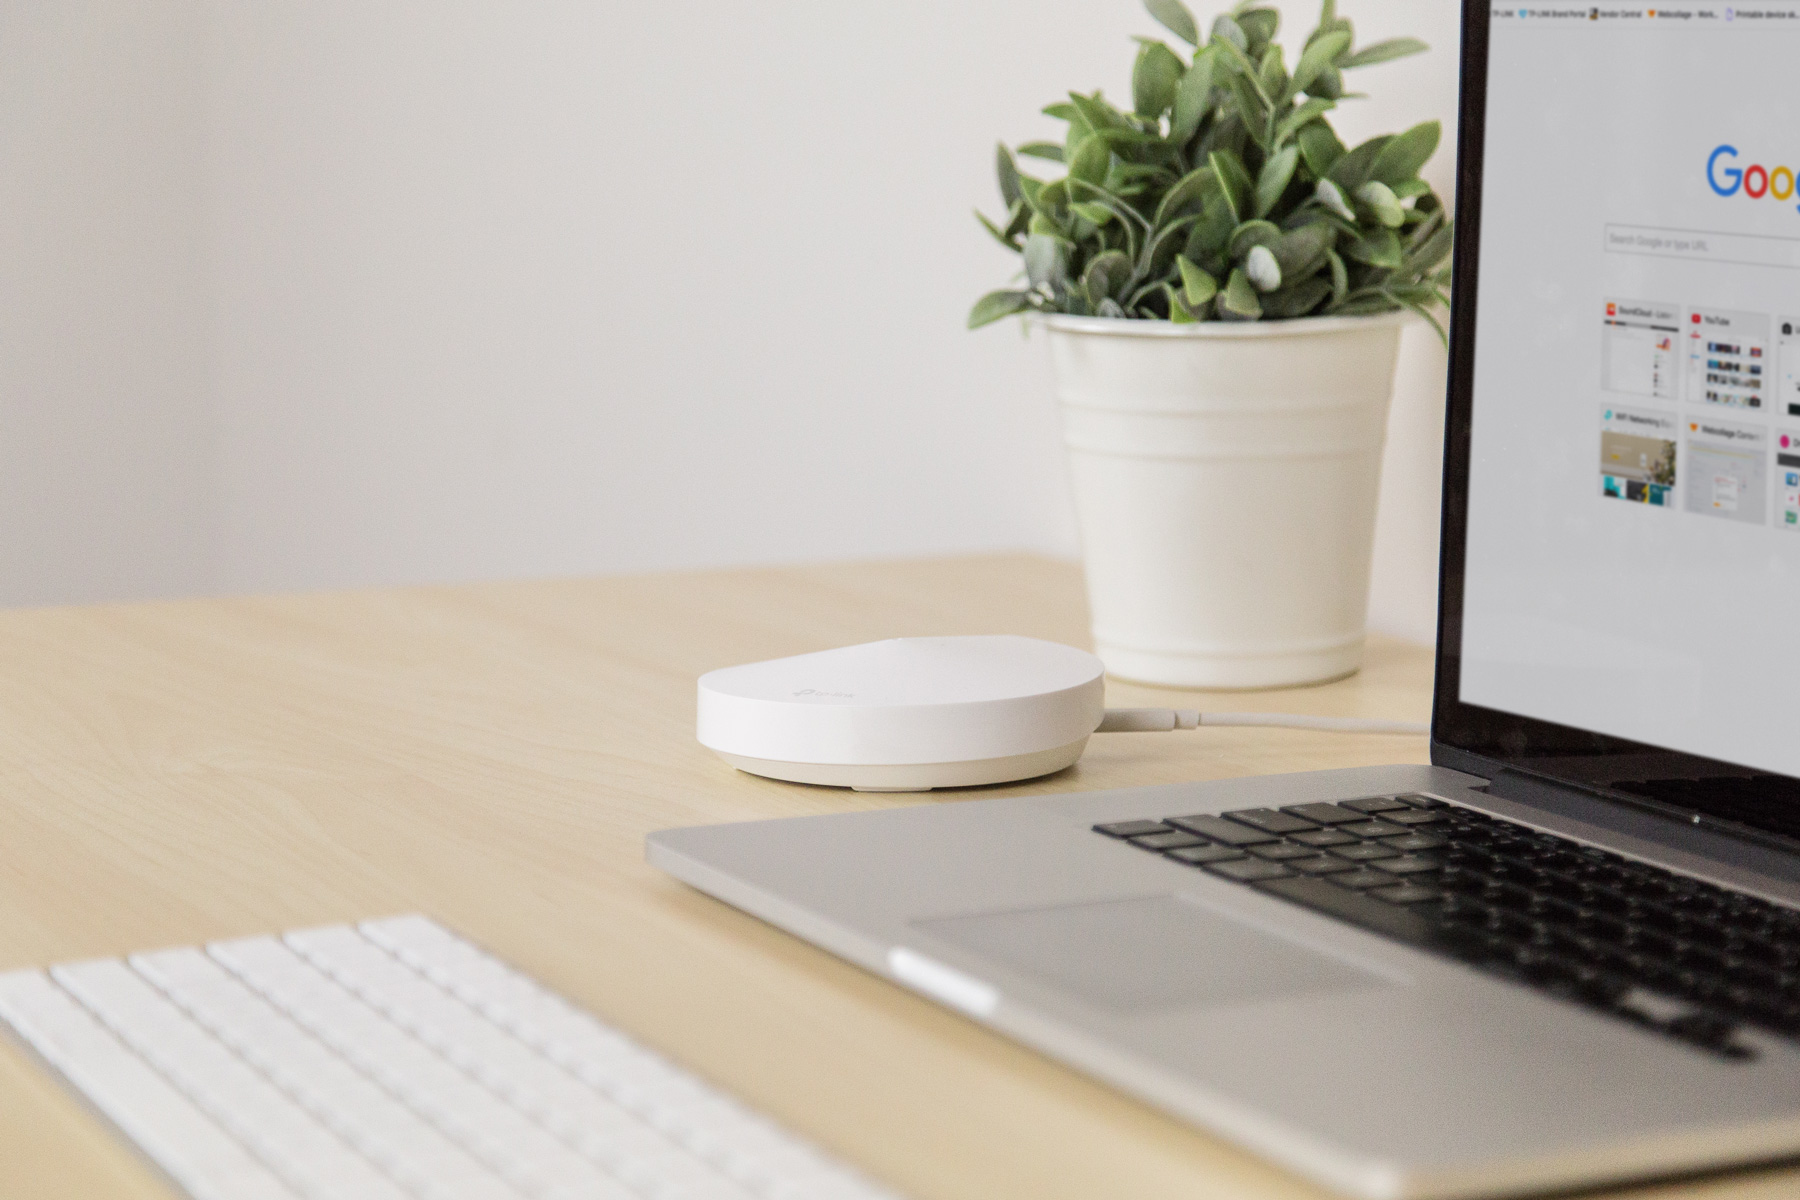 Deco M5 Whole-Home Wi-Fi Unit (1-pack)